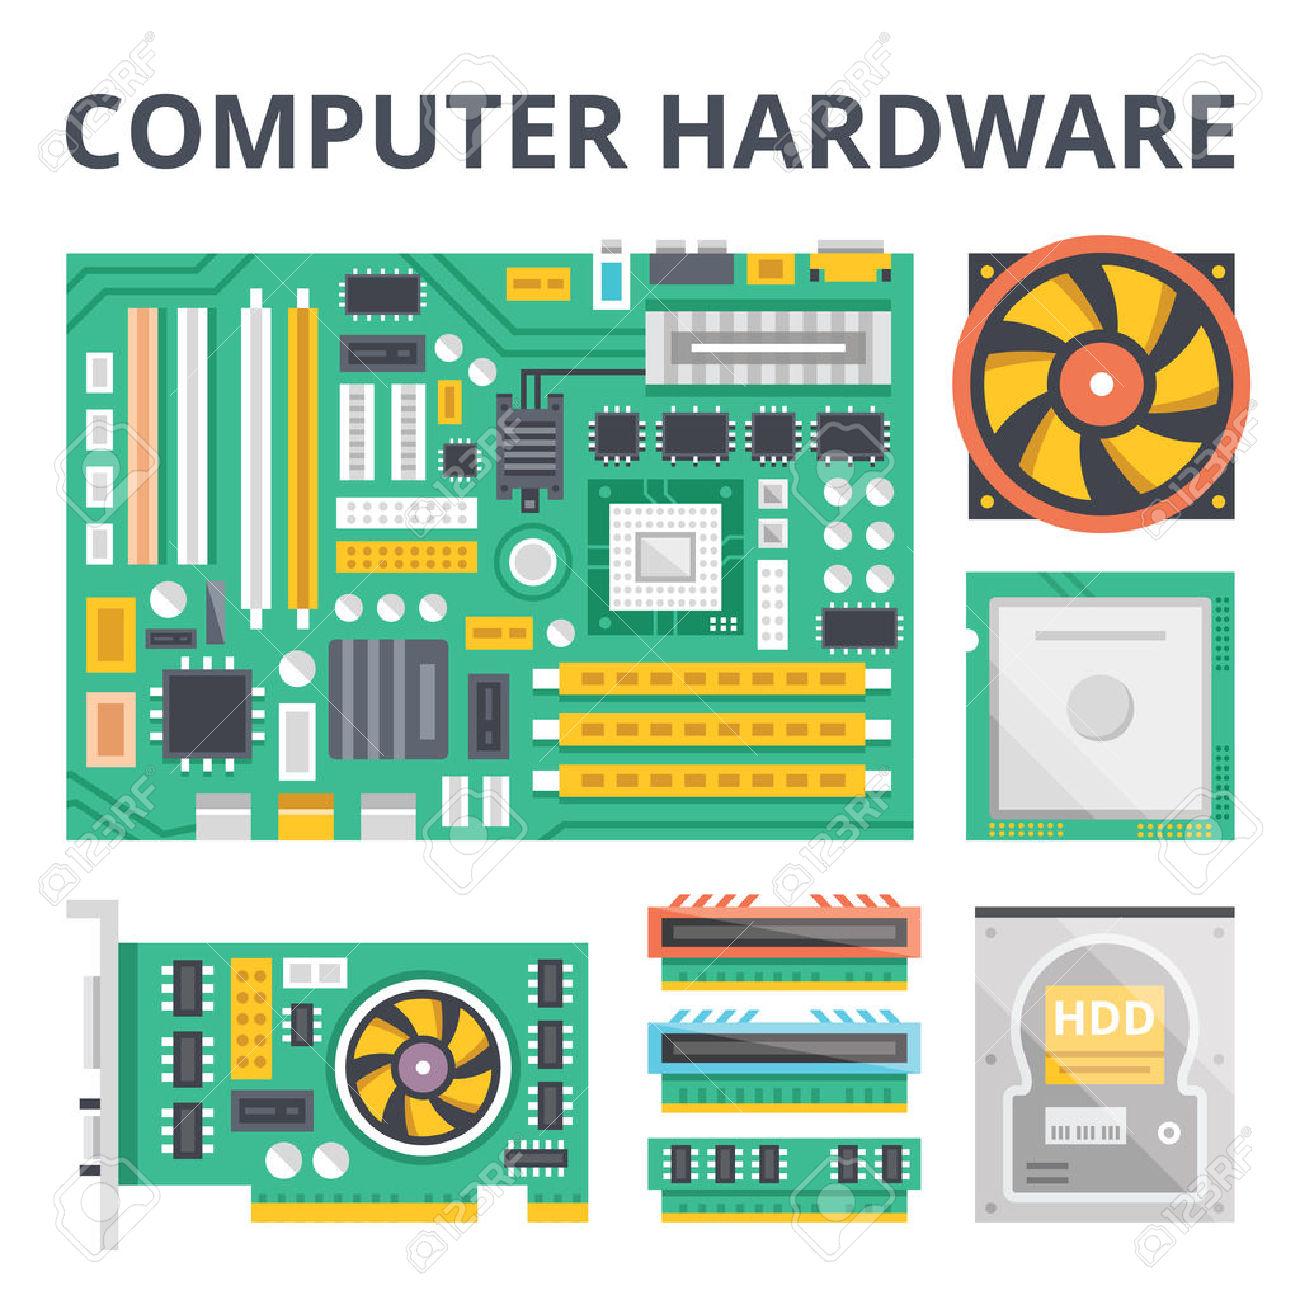 Technology clipart computer hardware Computer online Hardware #3058 Clipart